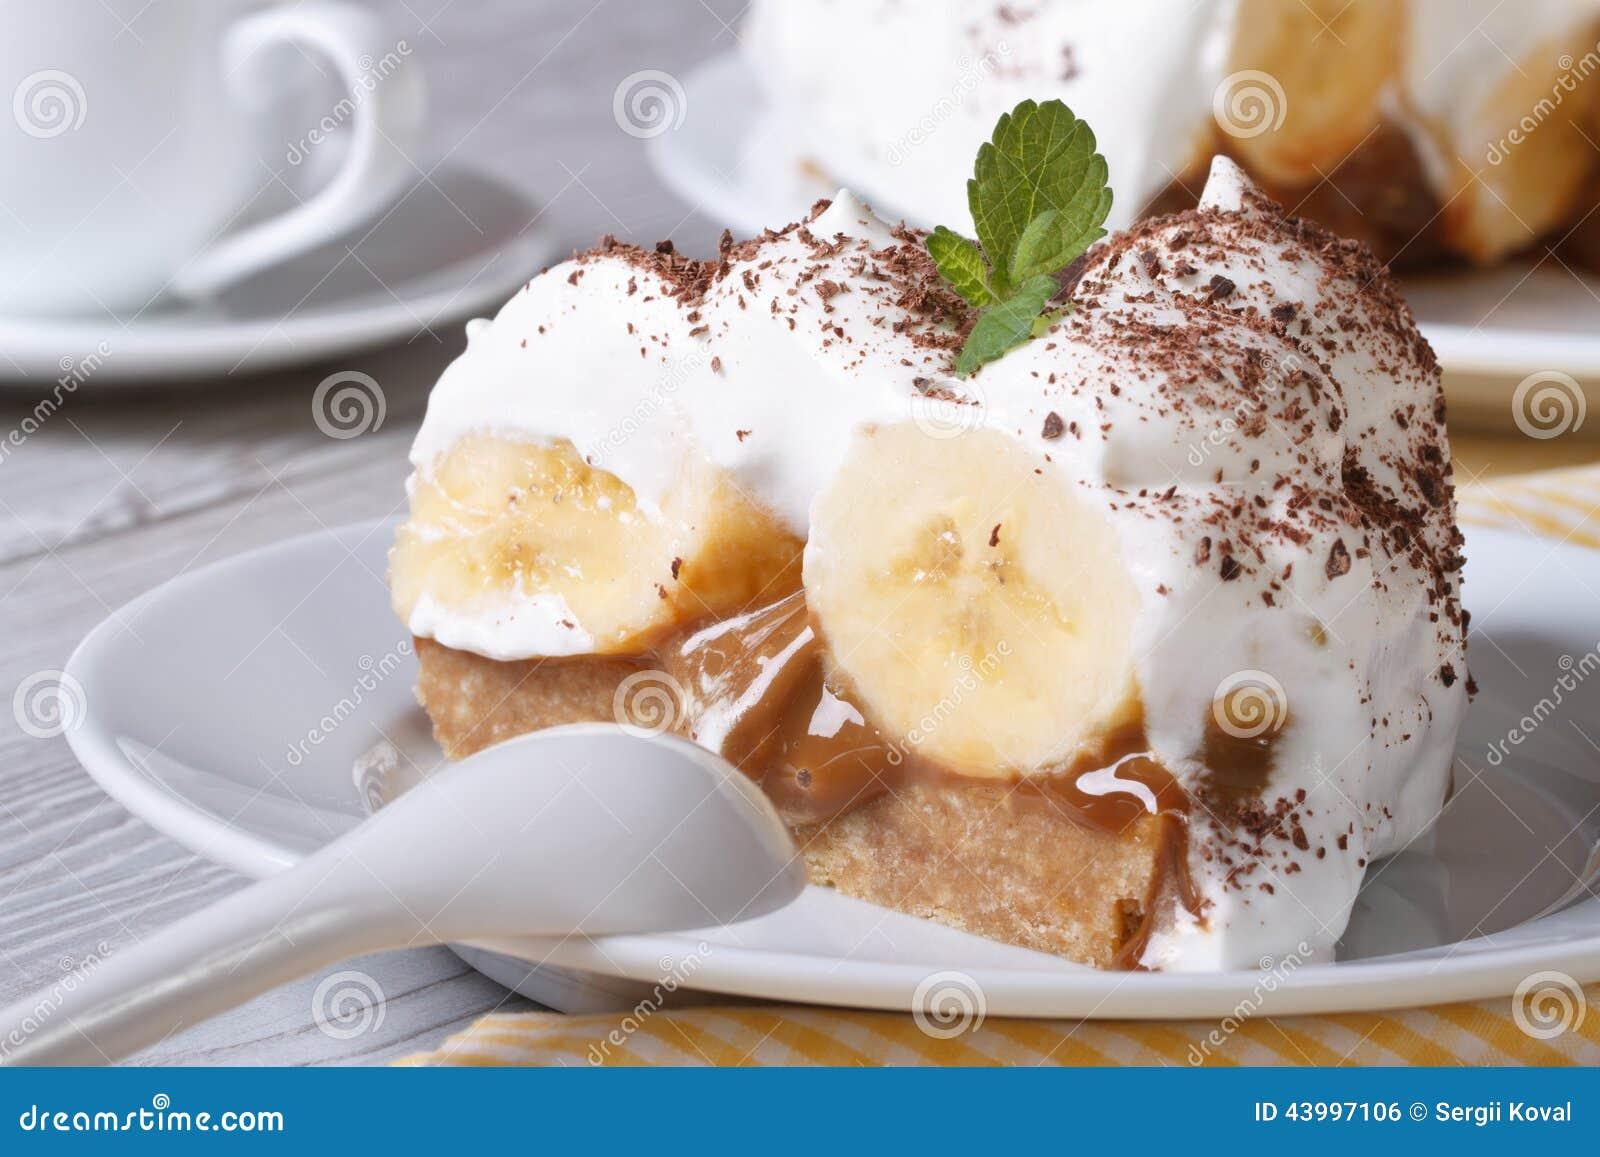 Gateau anglais a la banane